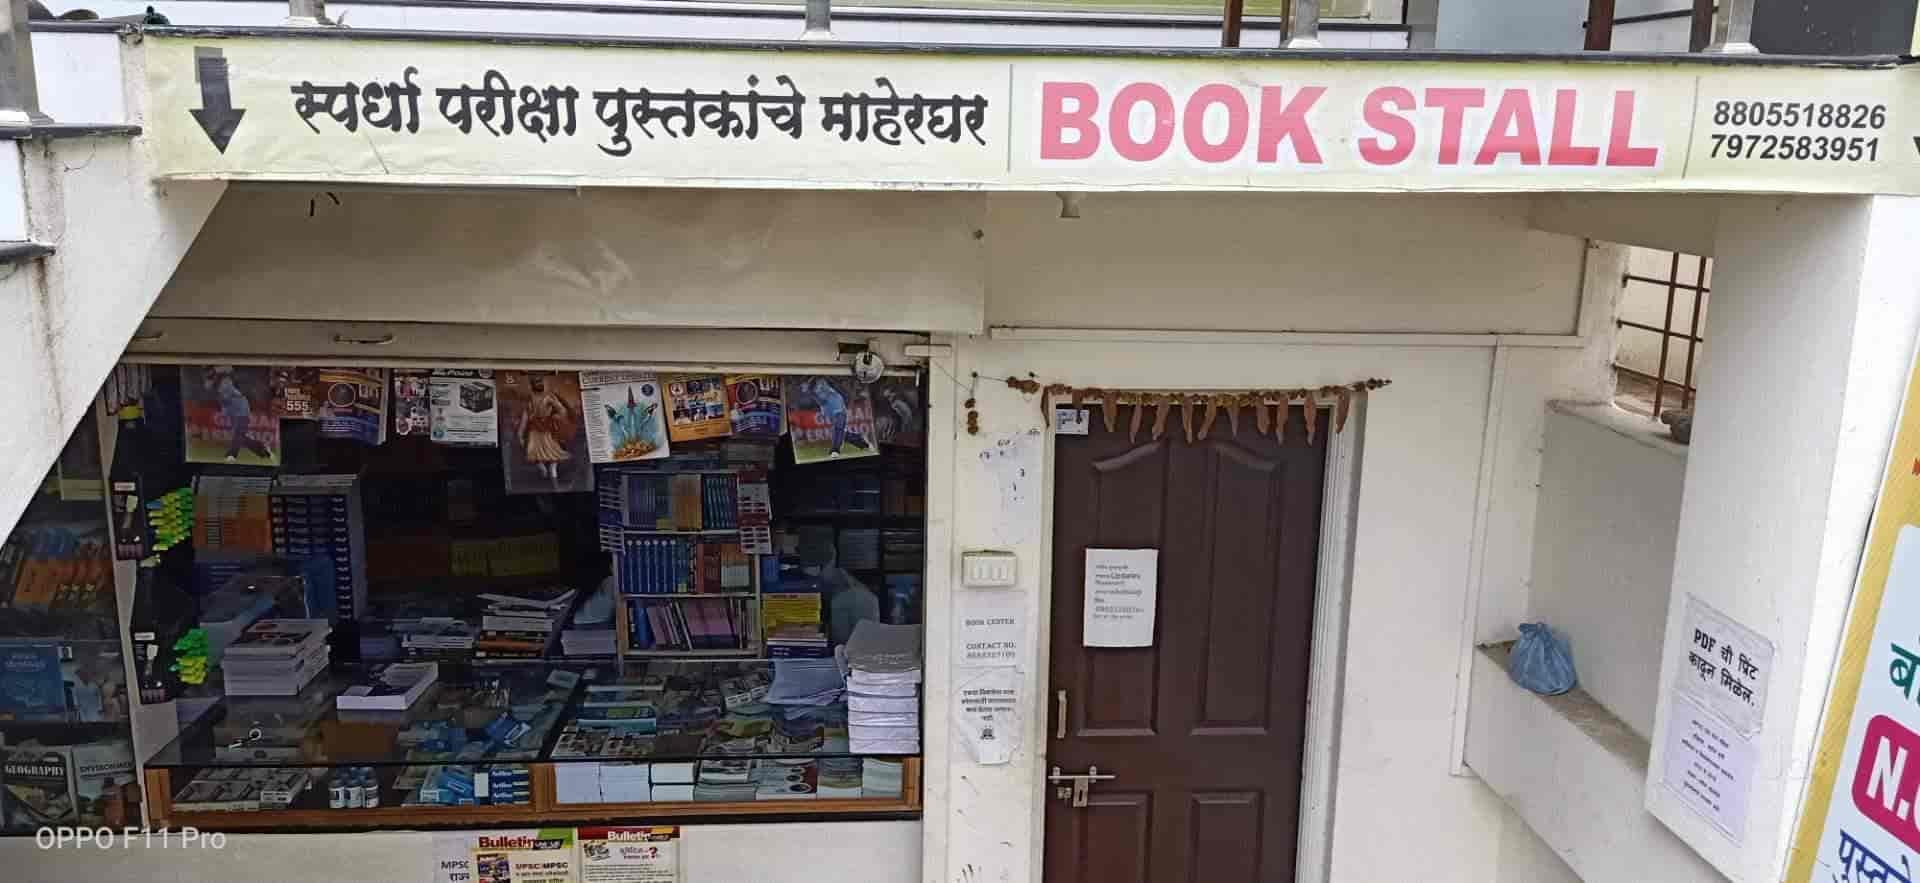 Student Book Shop Photos, Anand Nagar Chowk, Nanded